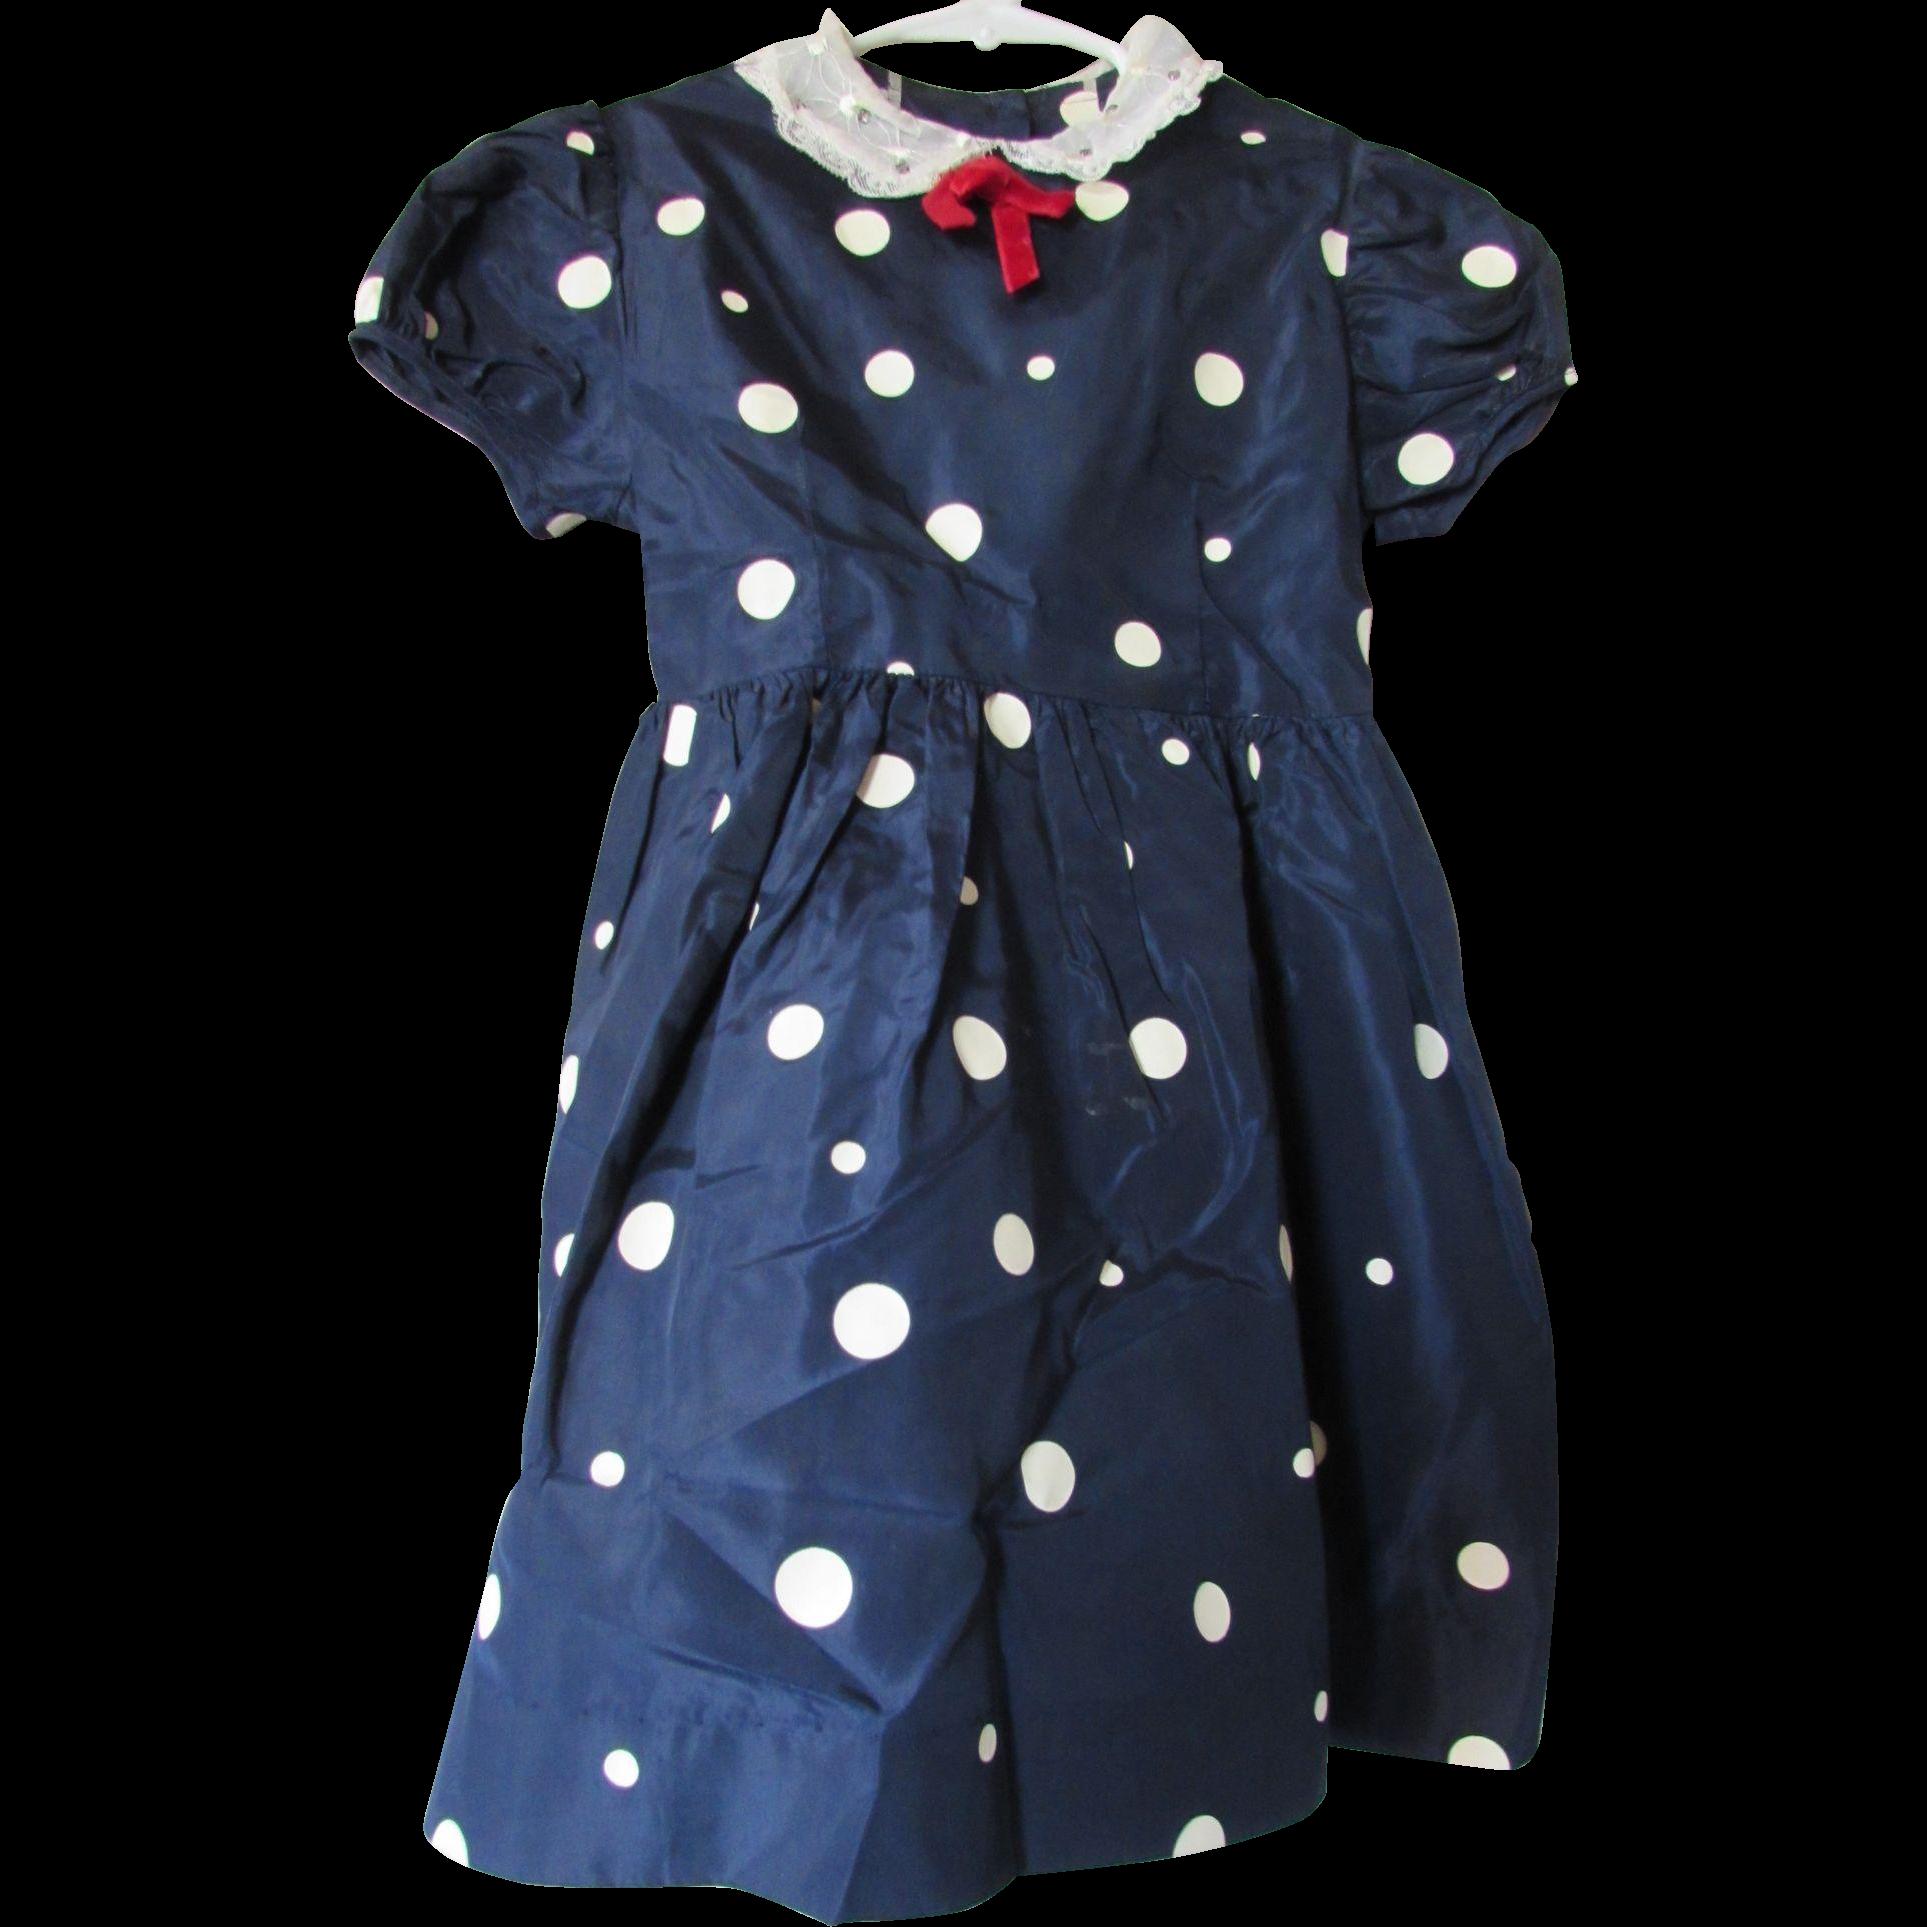 Mid Century Little Girl Party Dress in Navy and White Polka Dot Taffeta Alden's 1-6x Shop